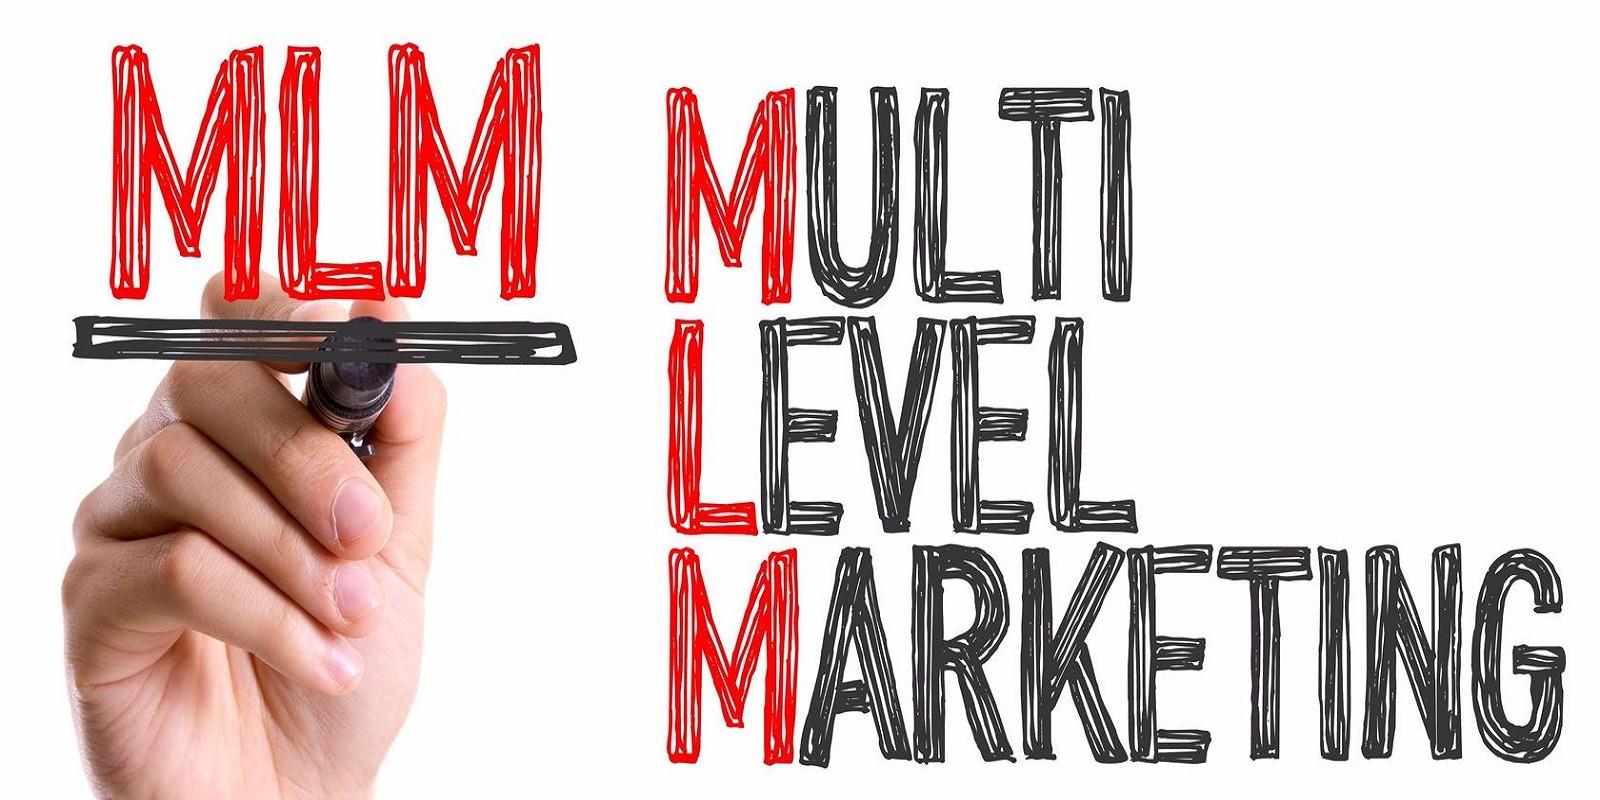 MLM - Multilevel Marketing System